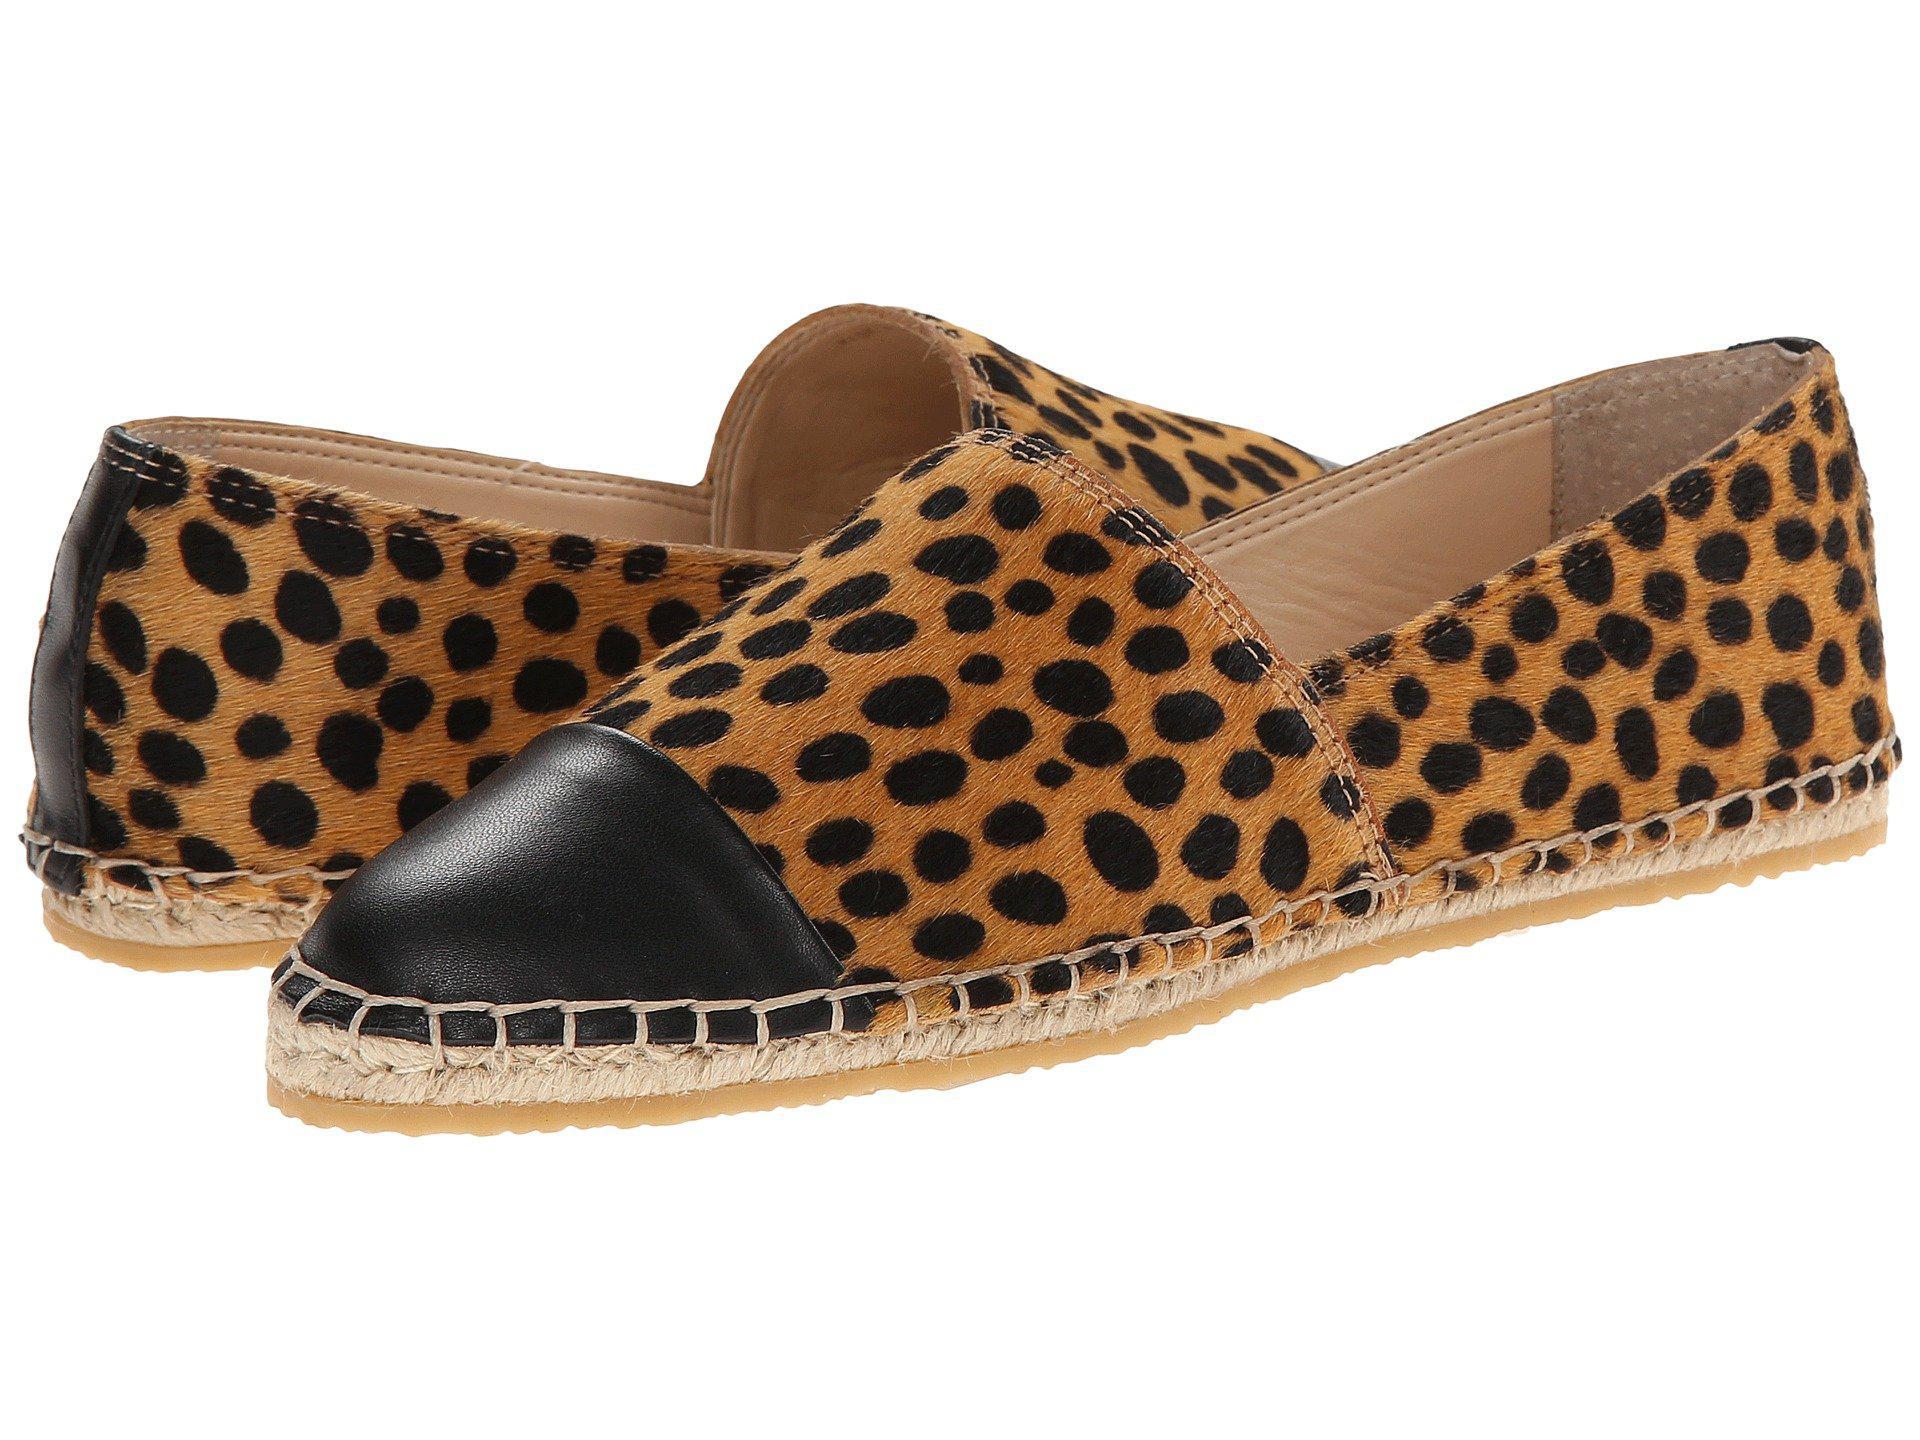 Loeffler Randall. Women's Brown Mara Calf Hair Espadrille Flats